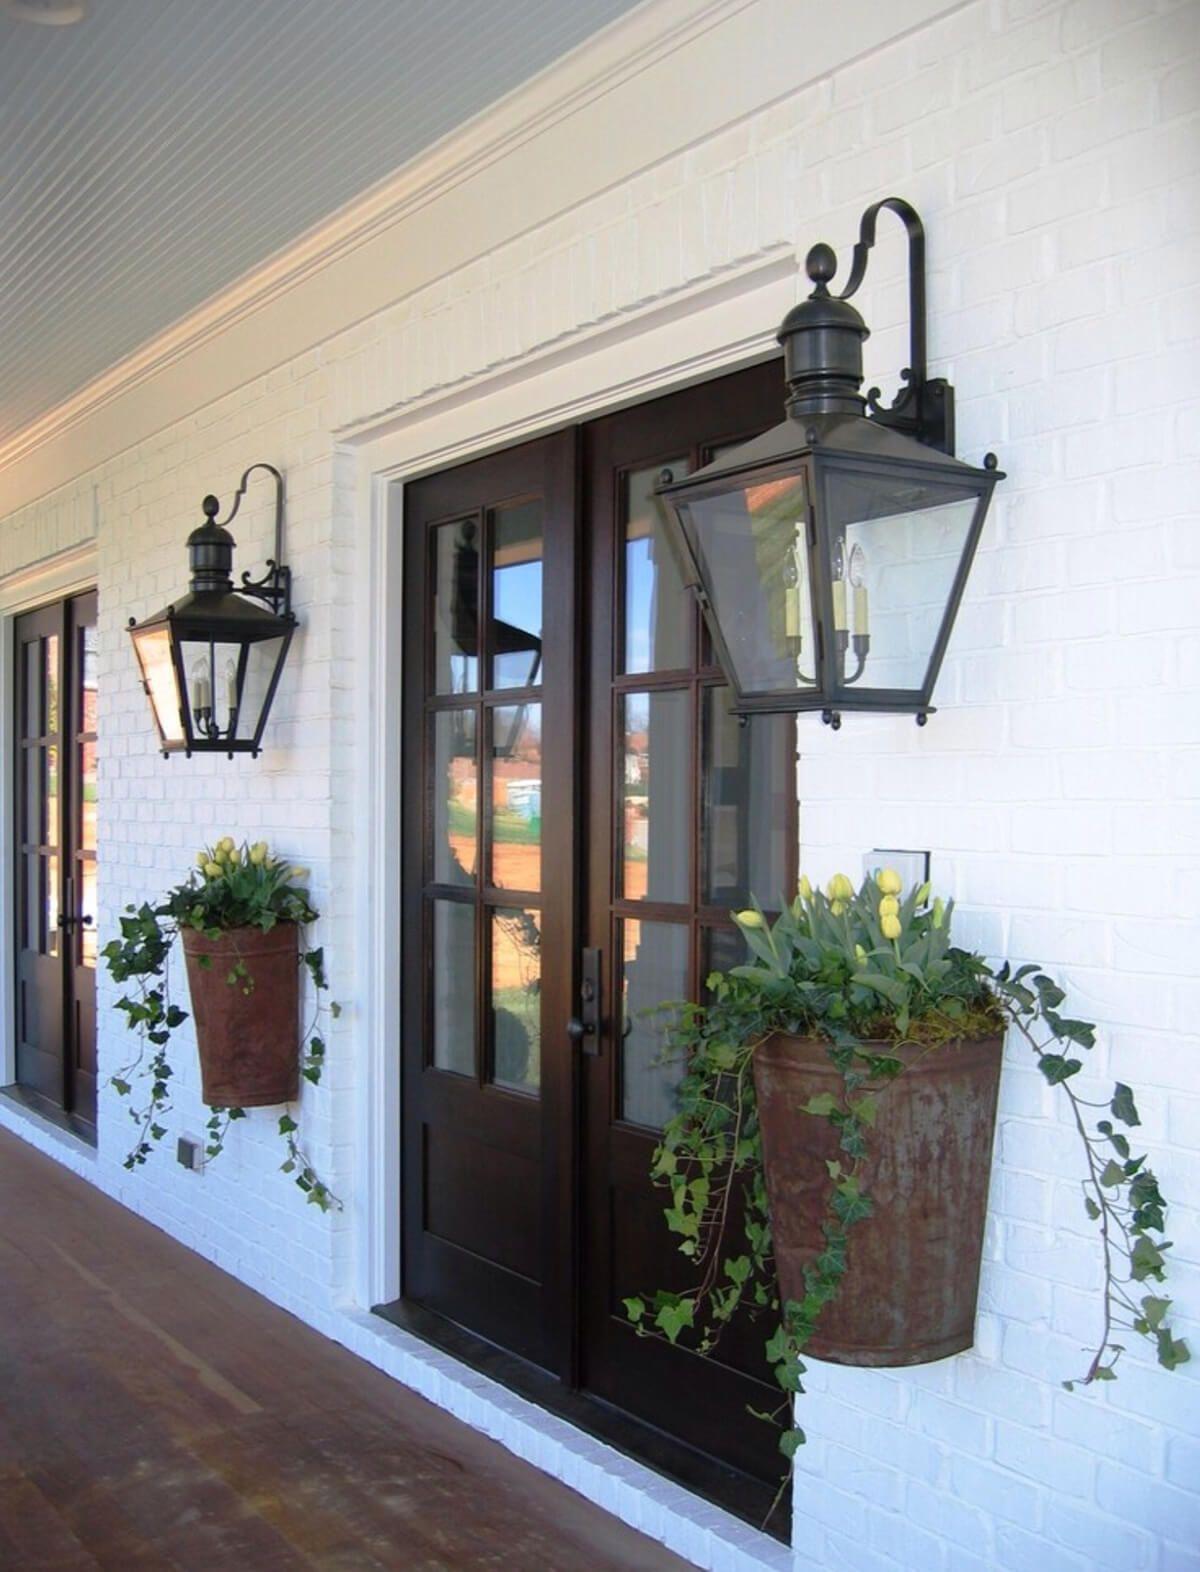 47 Rustic Farmhouse Porch Decor Ideas To Show Off This Season